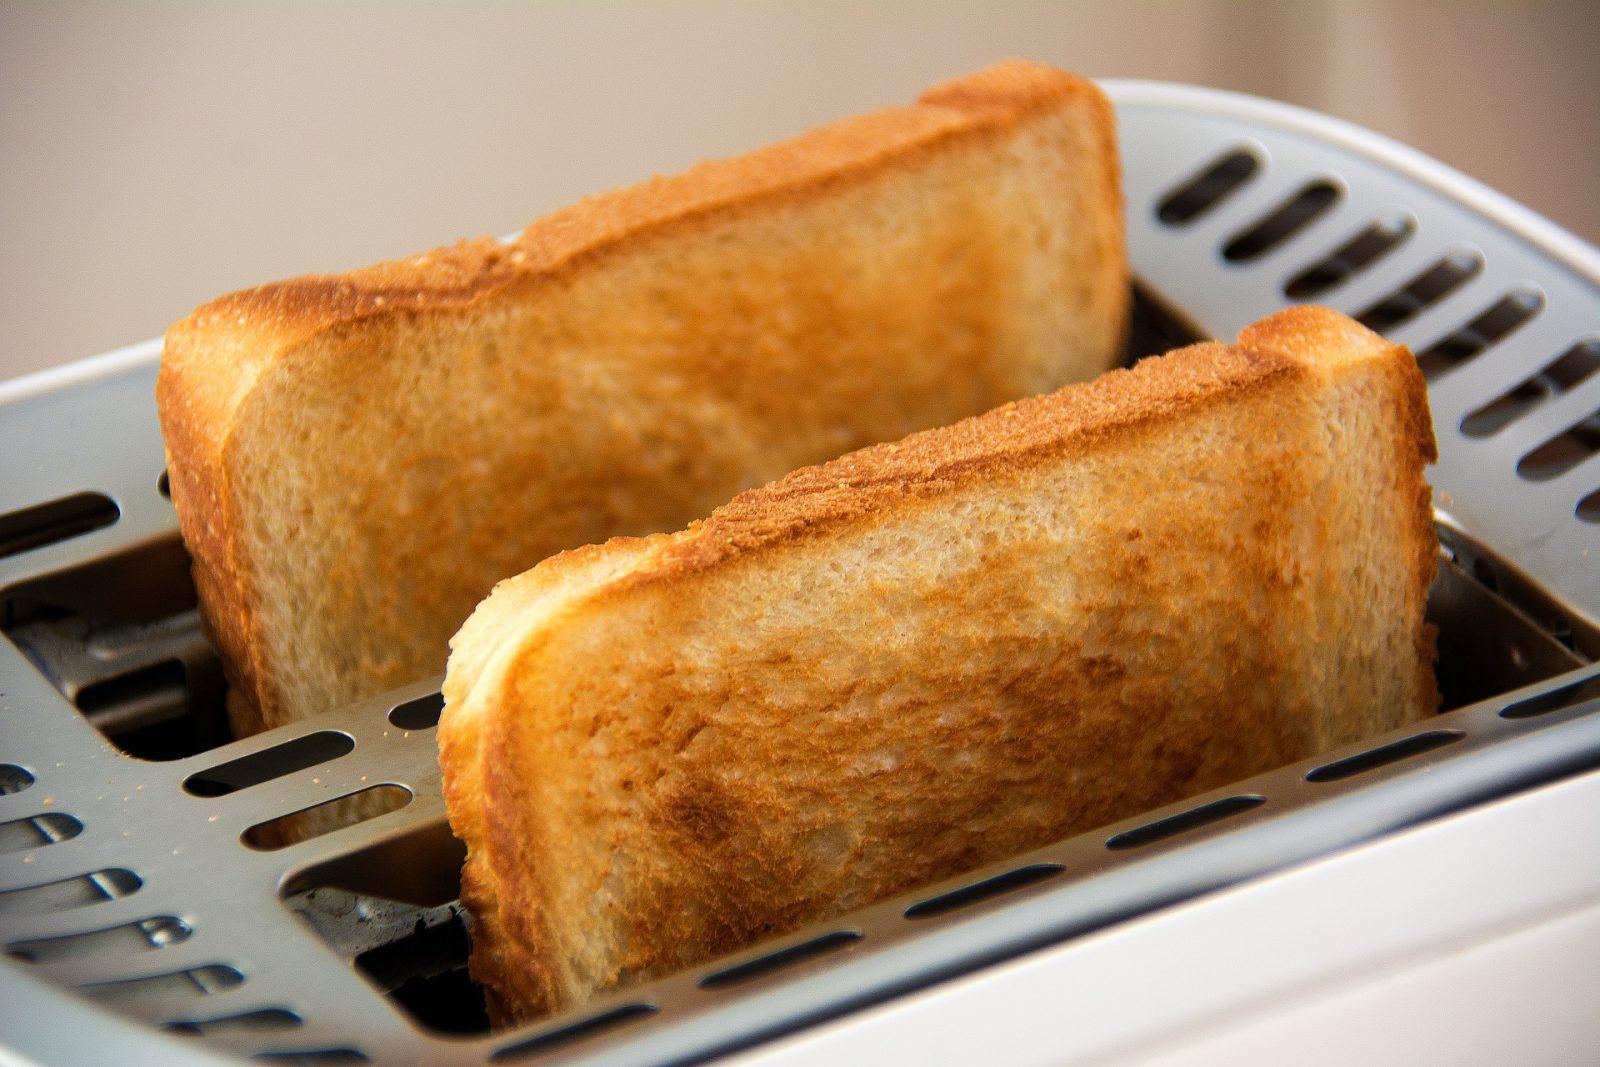 Scottish Inventions - toaster